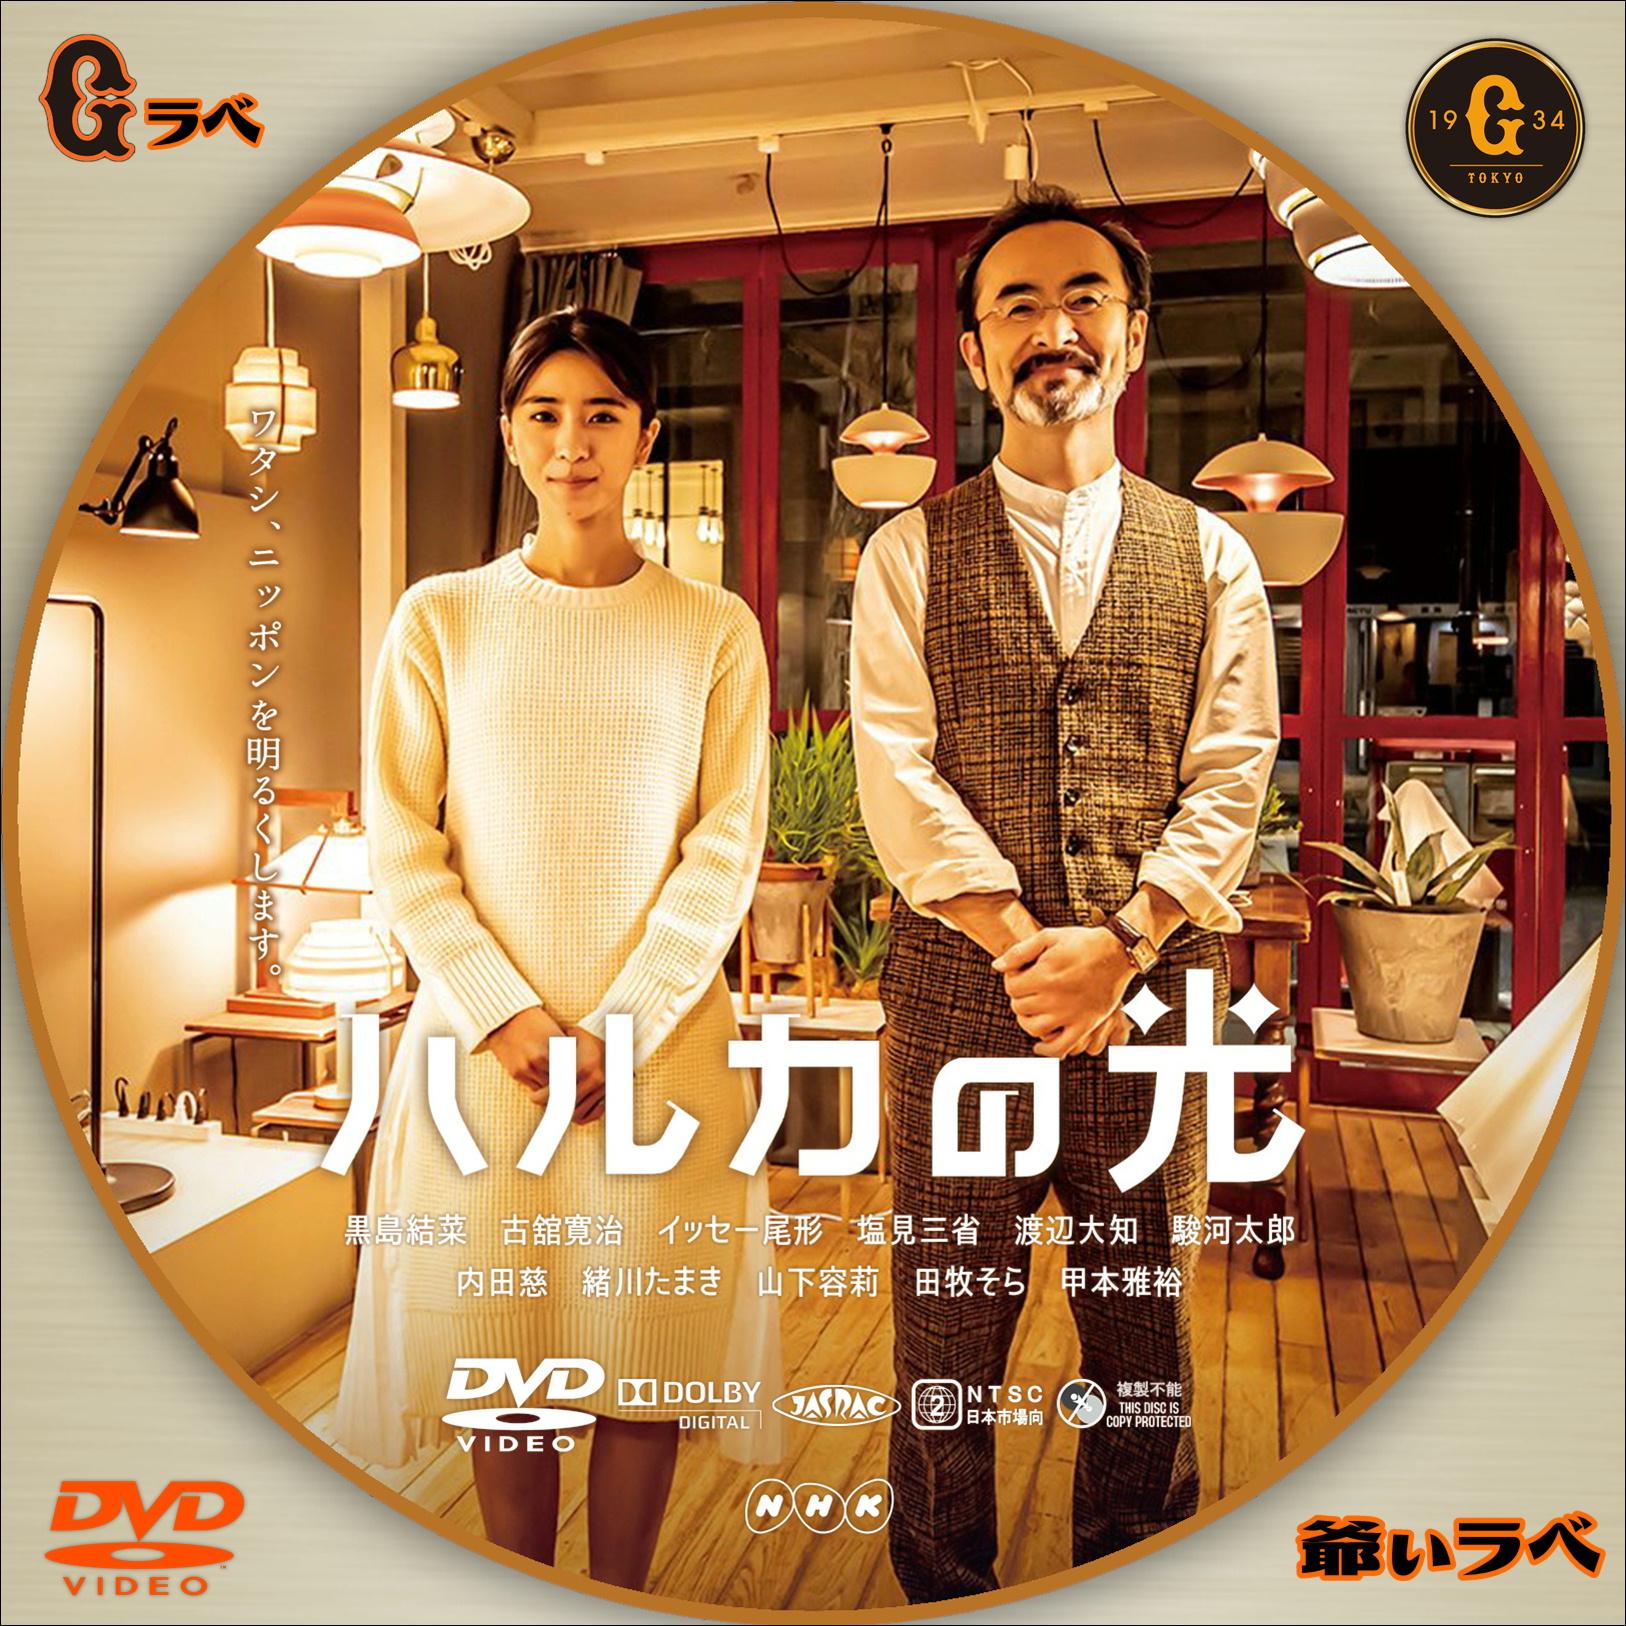 NHK ハルカの光(DVD)